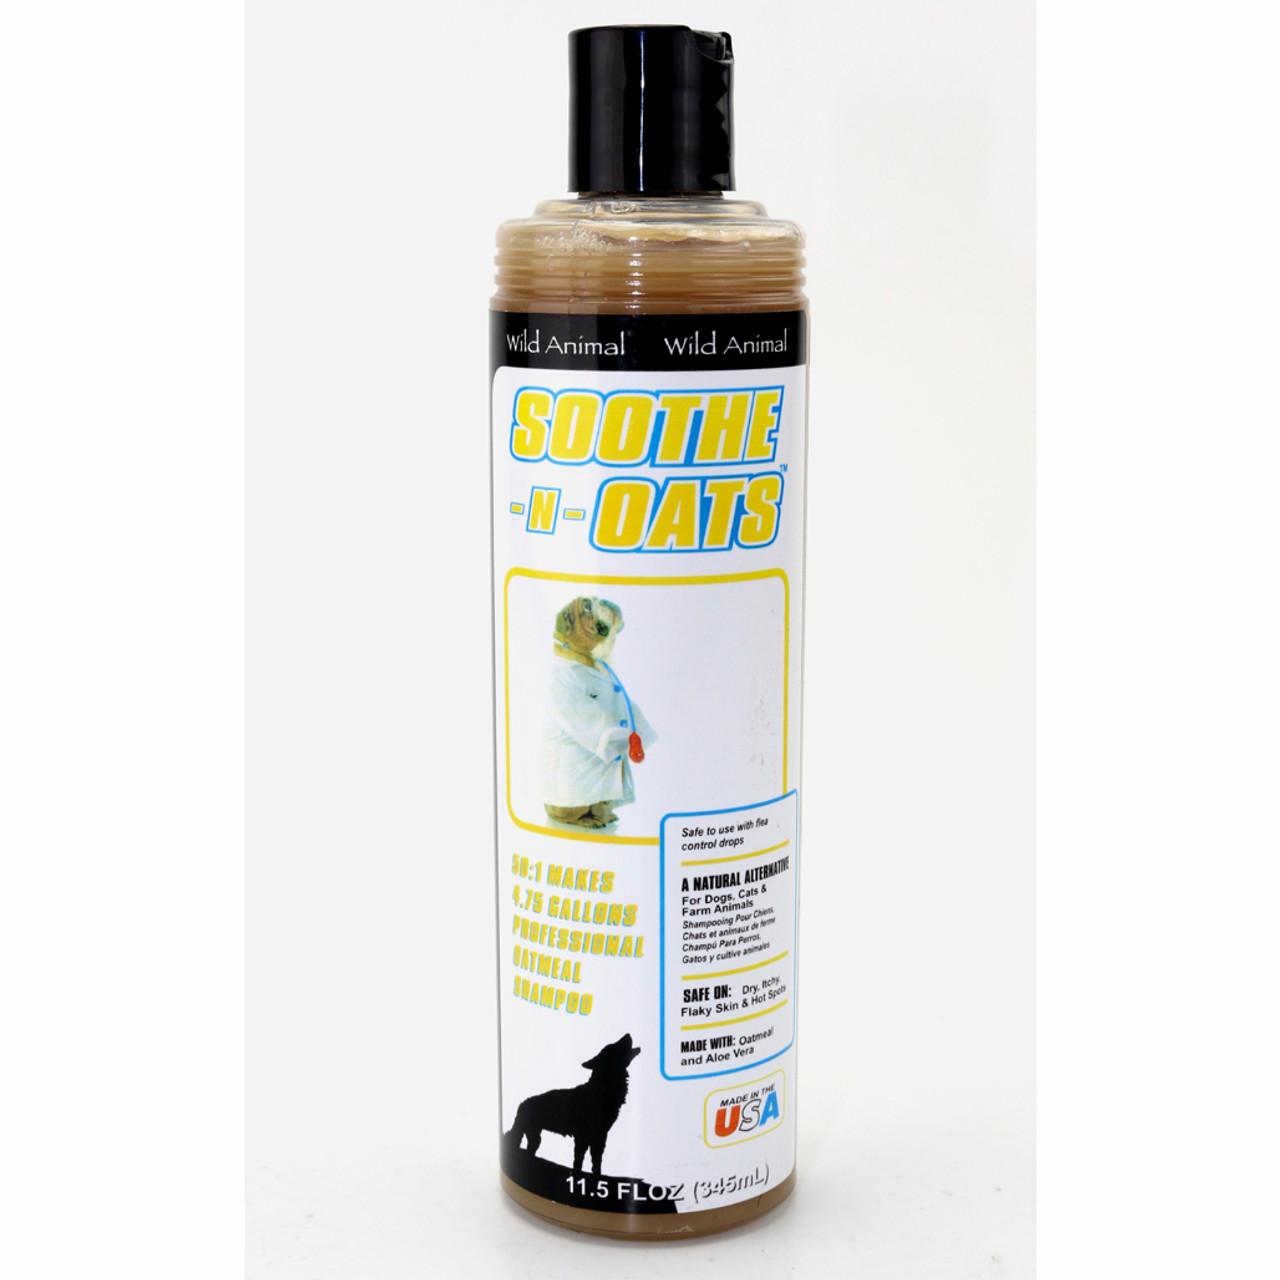 Soothe-N-Oats Shampoo 50:1 11.7 oz Size